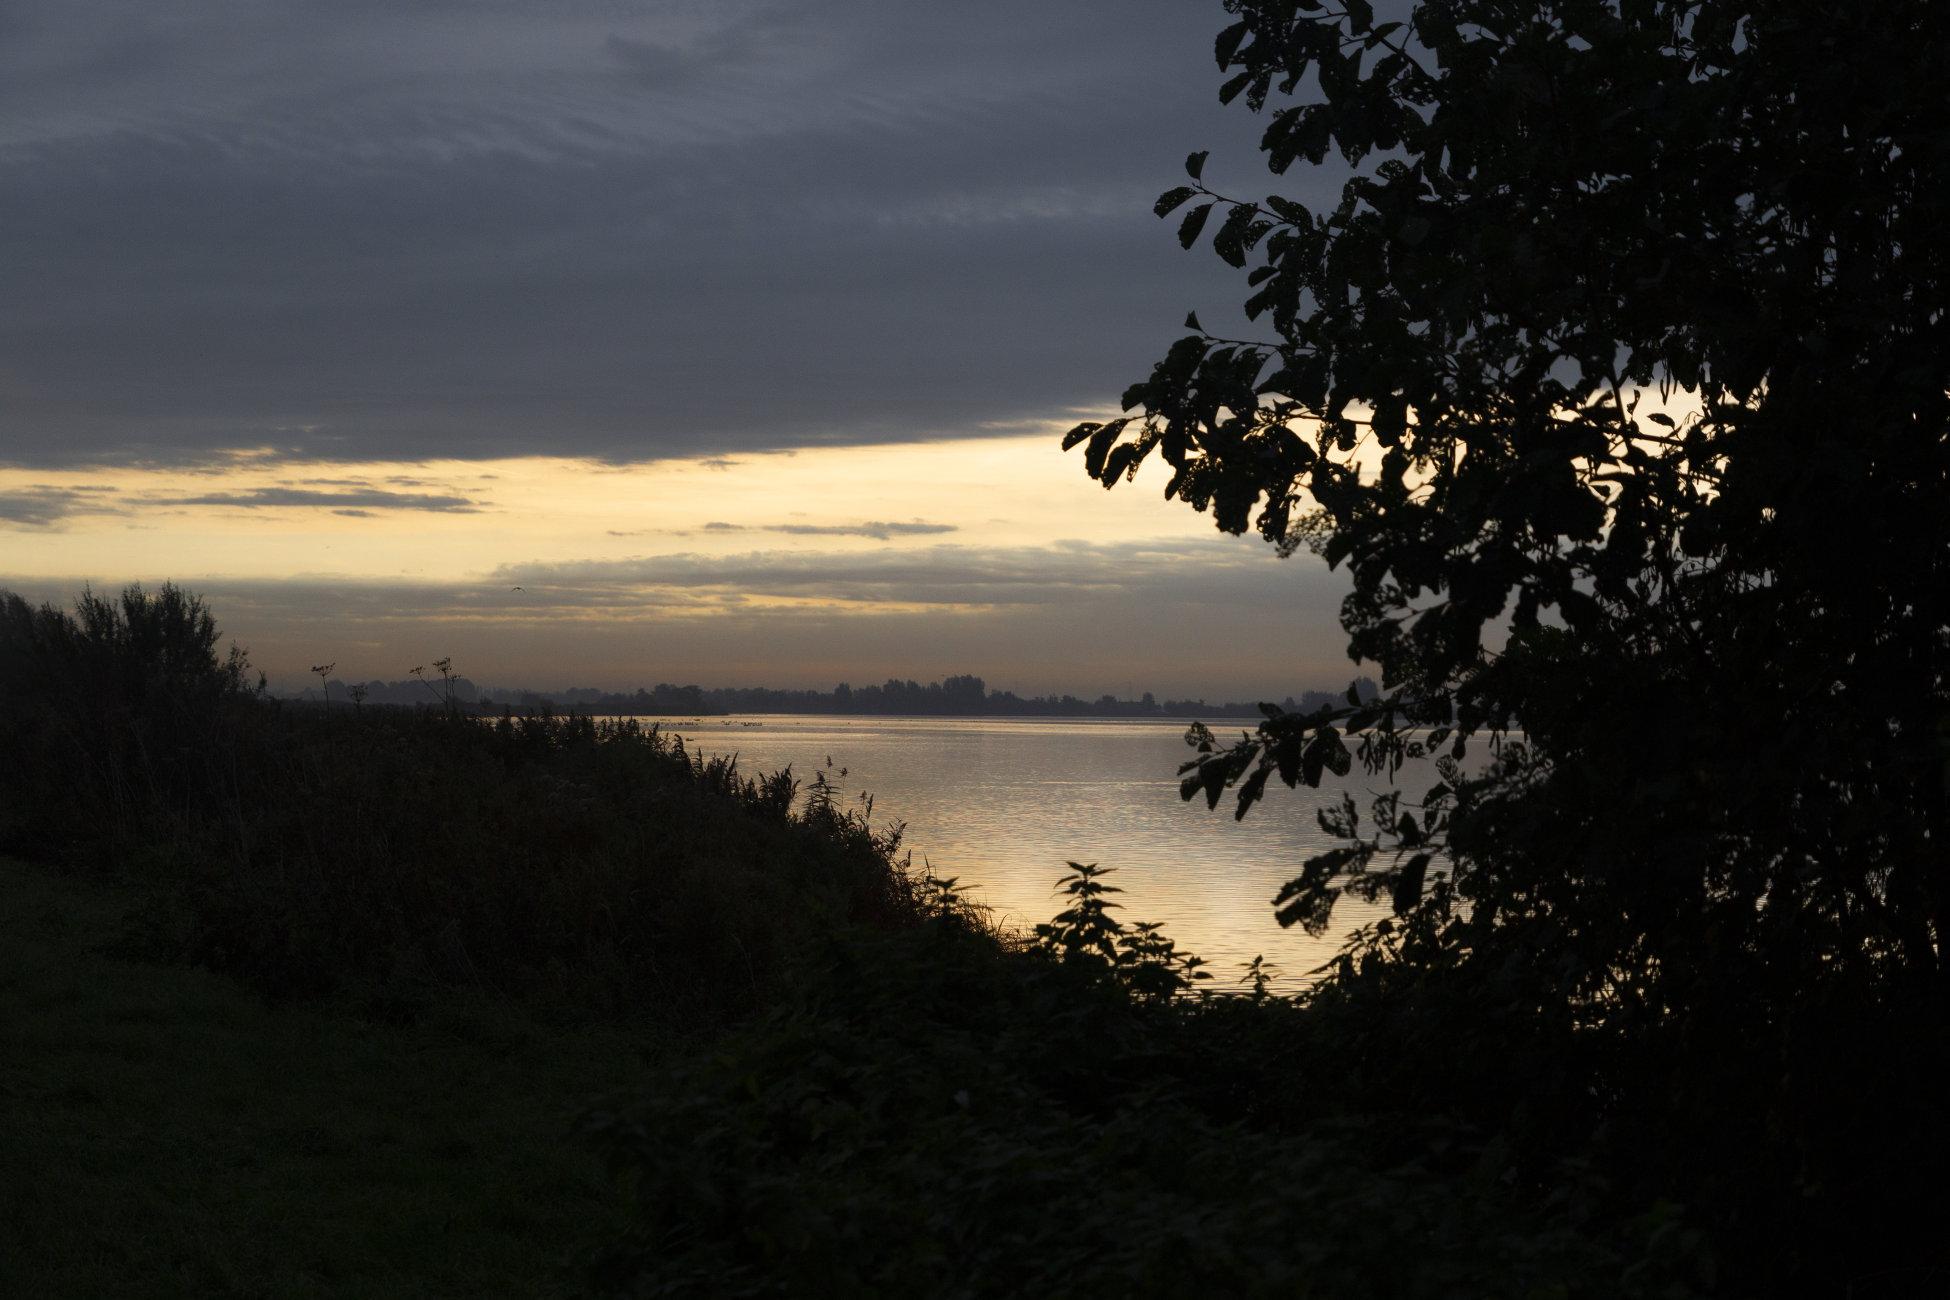 Reeuwijkse Plassen. (Plassen=Lakes)